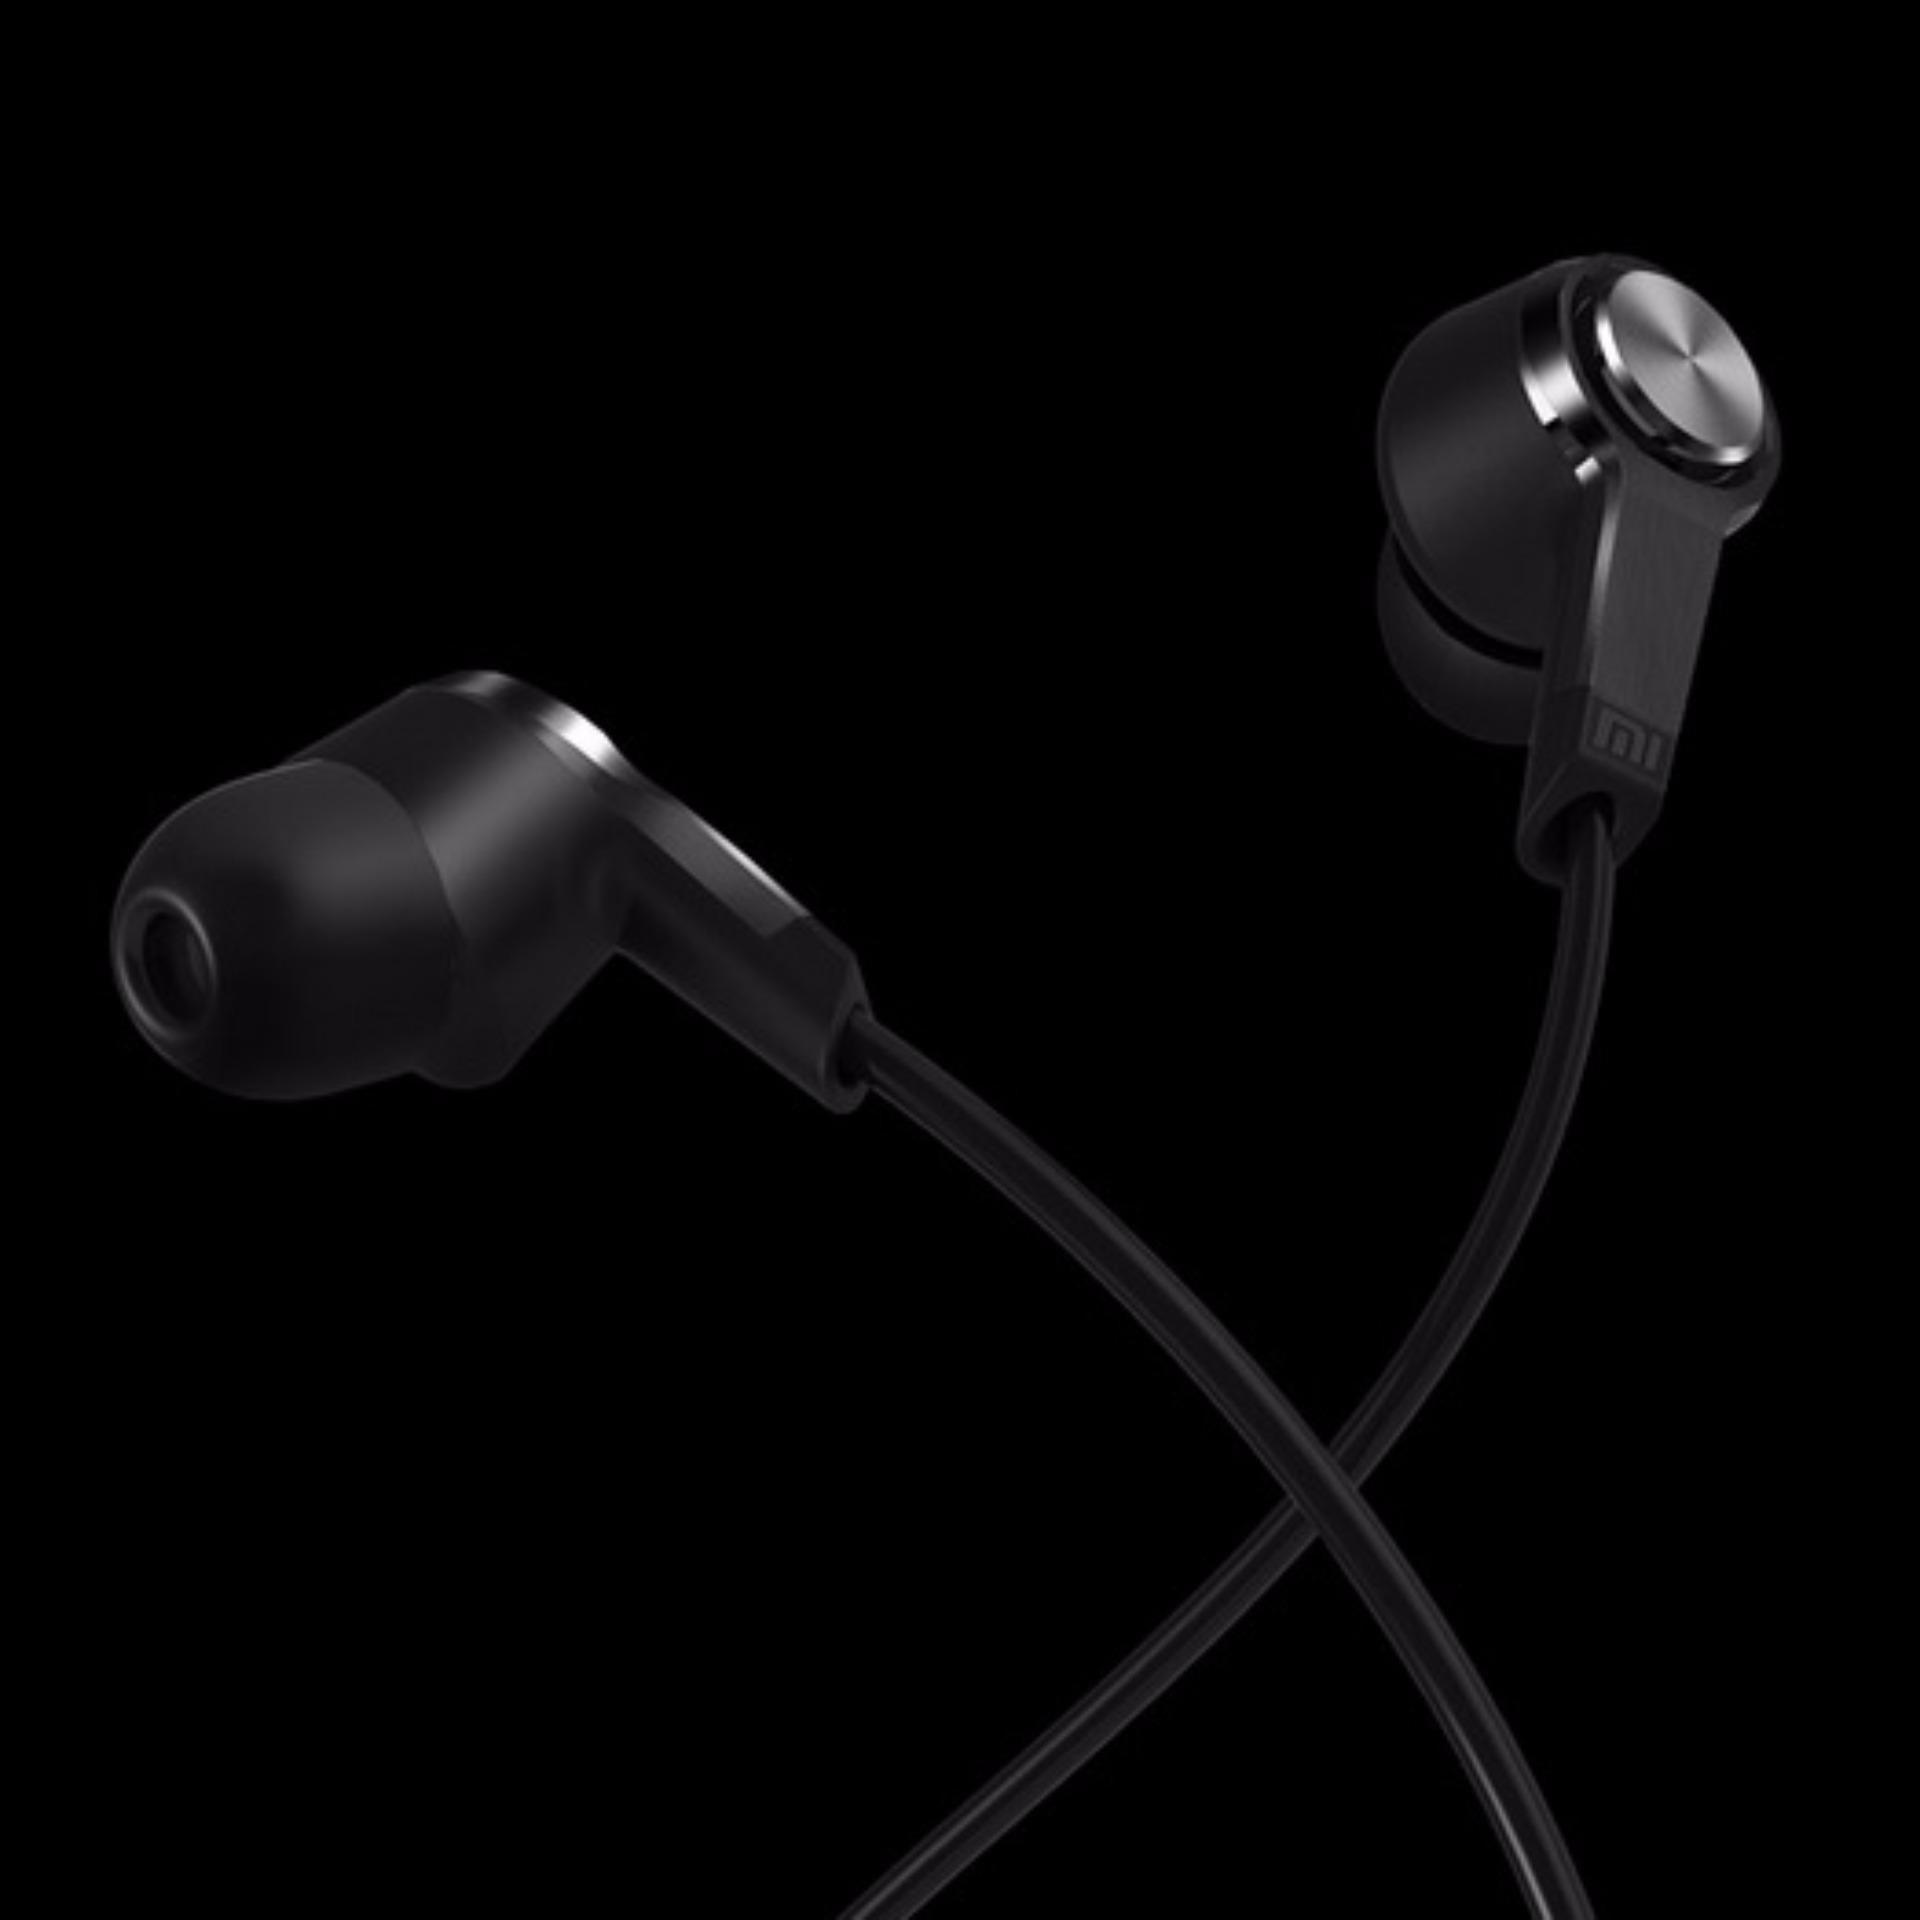 Xiaomi Original Handsfree Mi 3rd Gen In-Ear Headphone - Hitam .